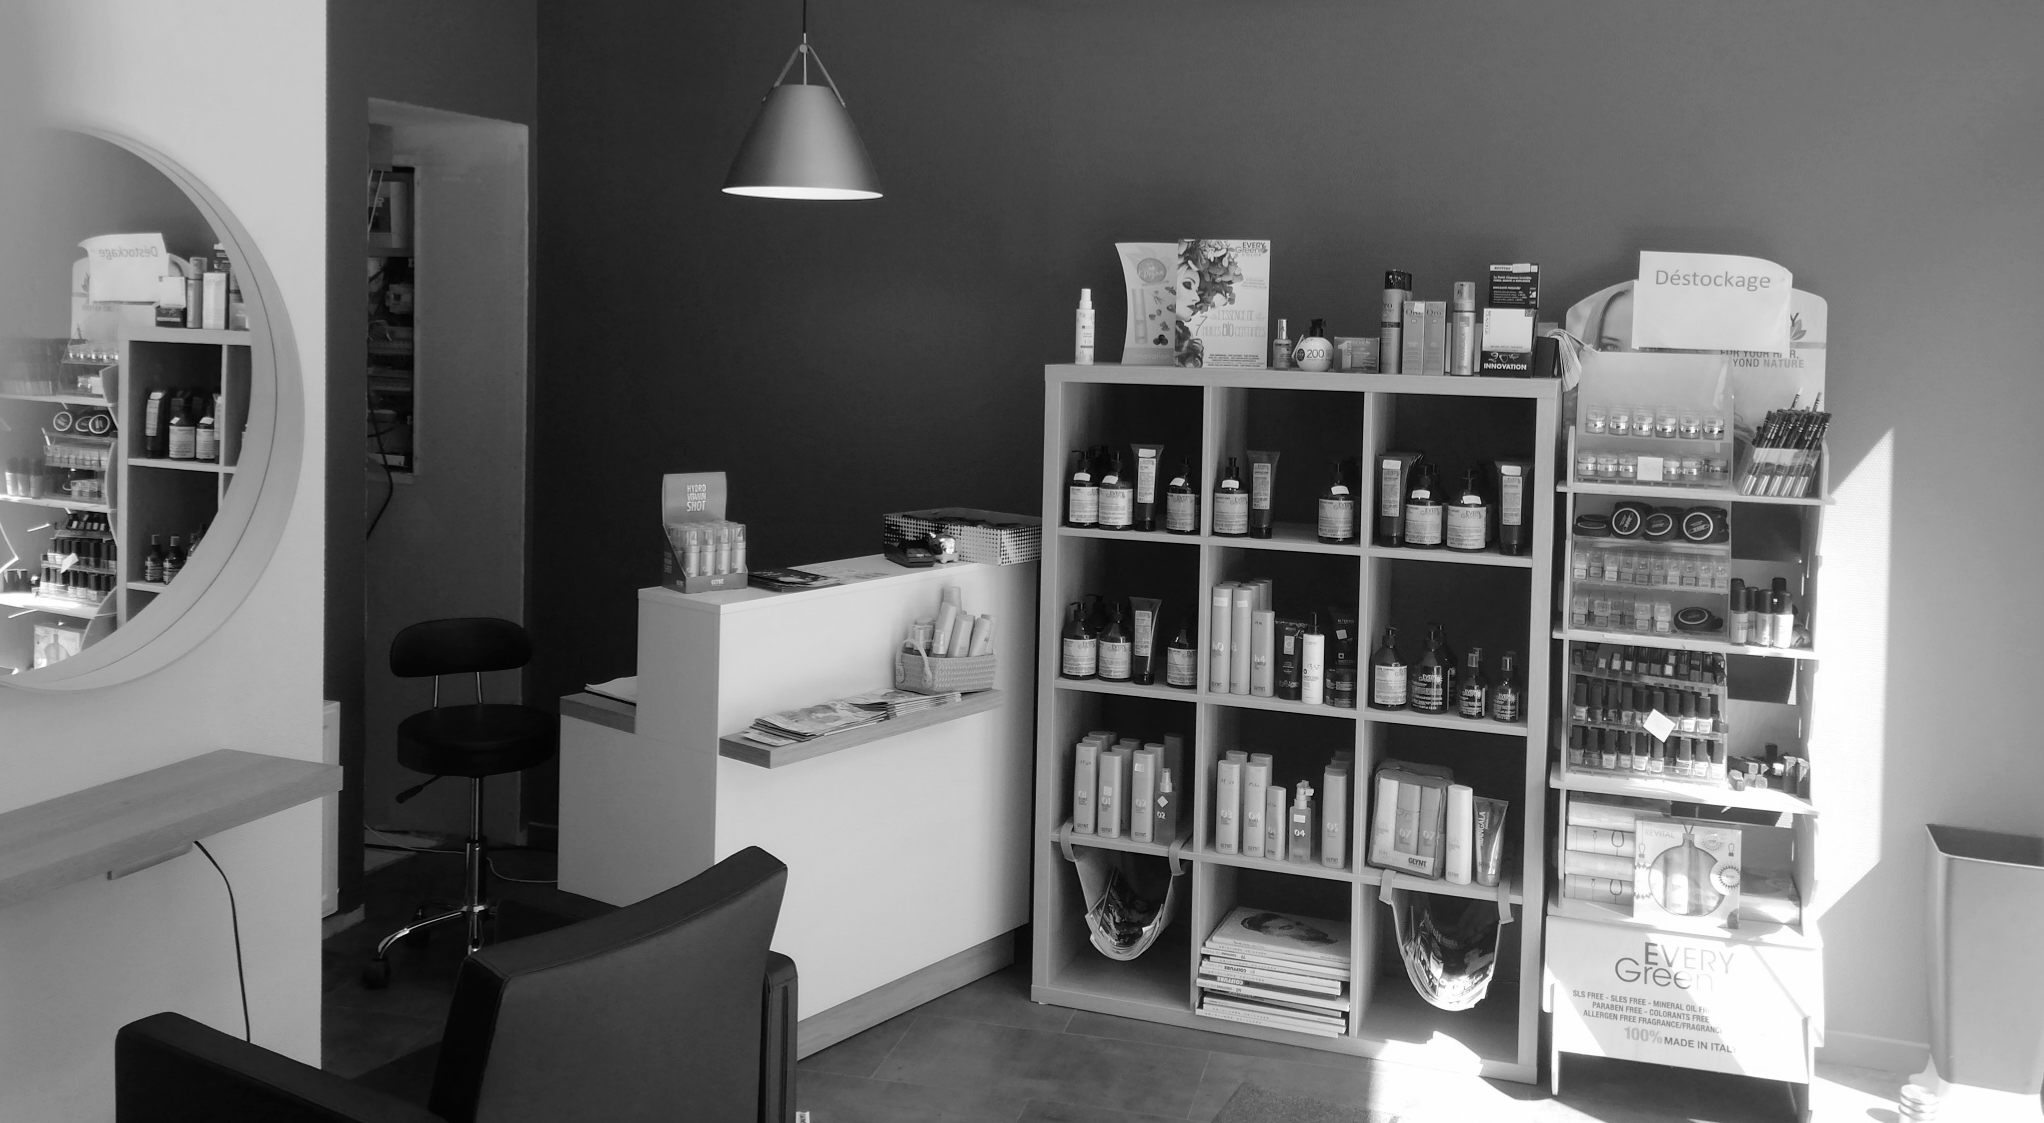 Salon De Jardin Americain salon palace coiffure - jardin botanique à metz : -50% sur